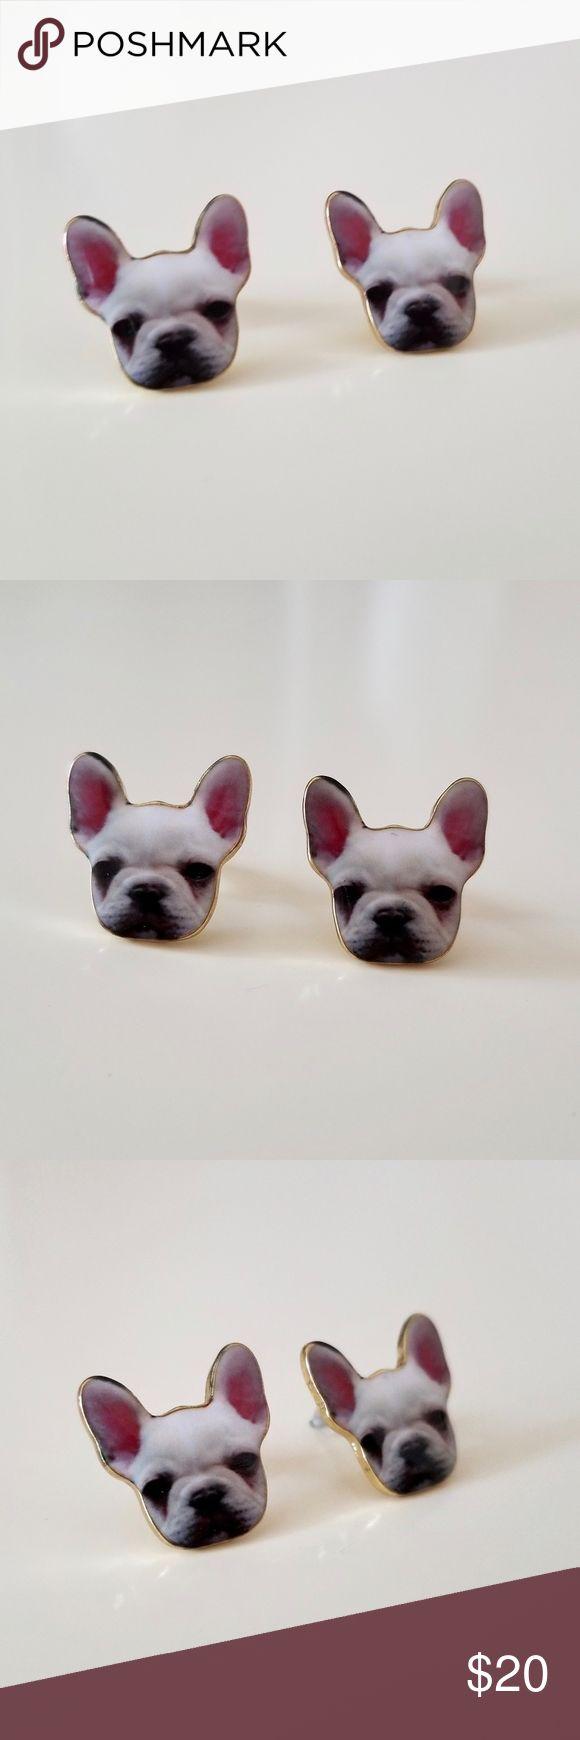 NWOT Cute Stud French Bulldog Dog Earrings Brand new, never worn pug earrings, with push backs. Jewelry Earrings